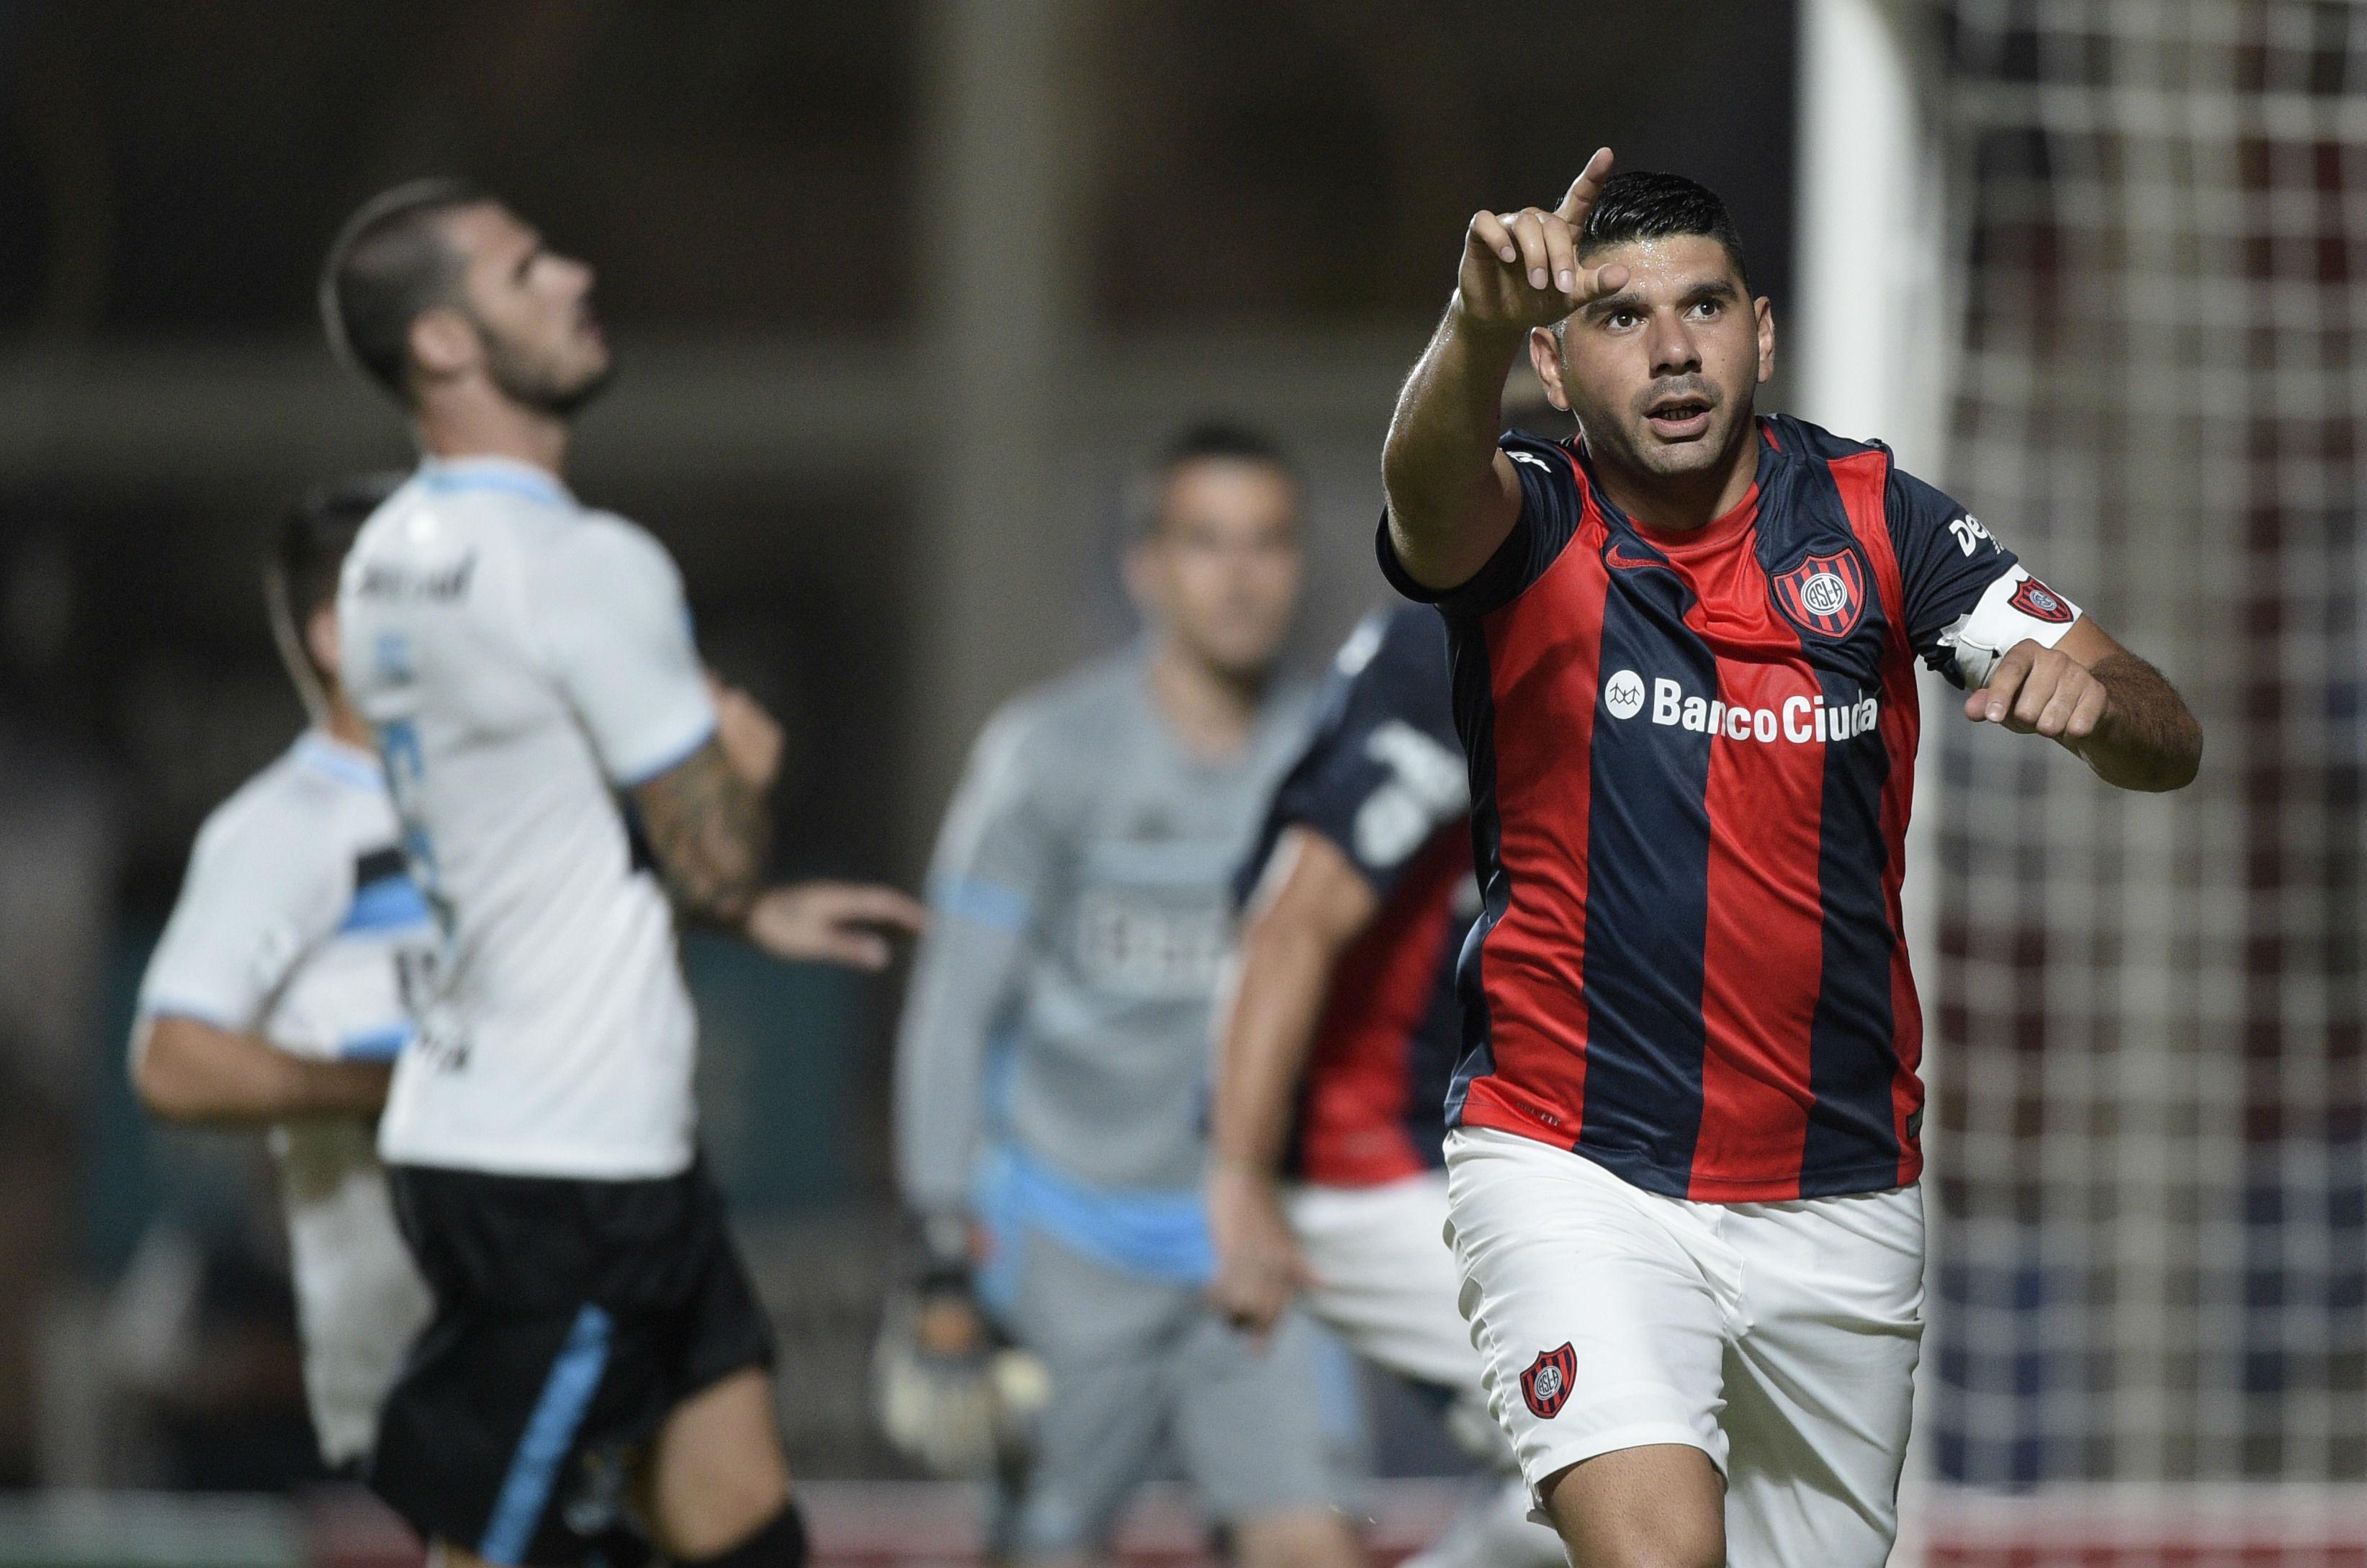 Néstor Ortigoza llegó a un acuerdo para jugar en Olimpia de Paraguay